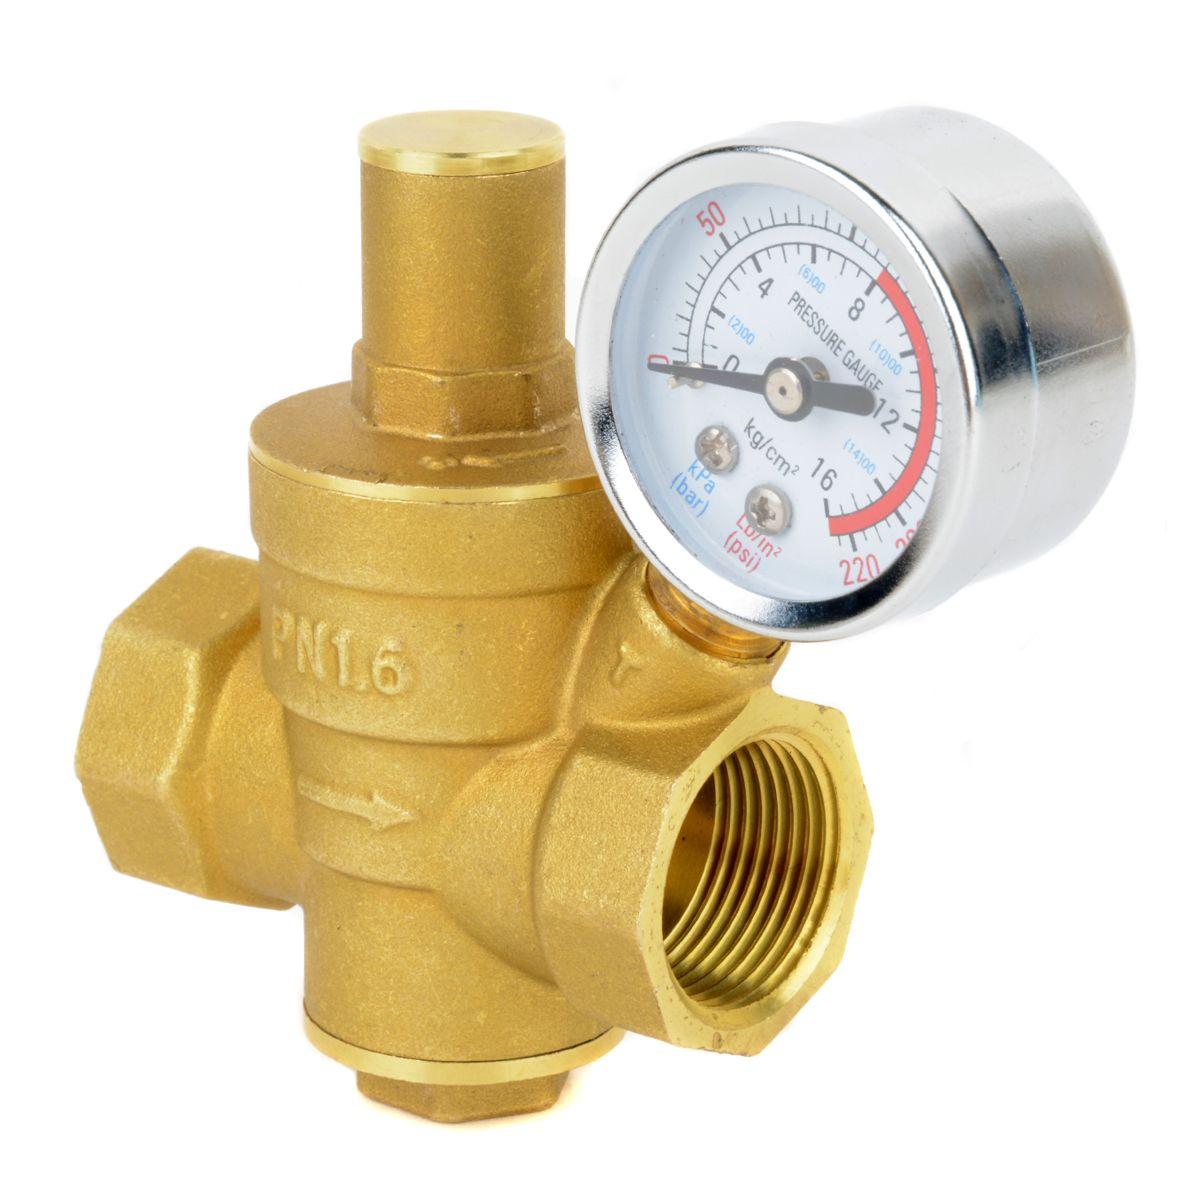 DN20 3/4 Brass Water Pressure Reducing Maintaining Valves Regulator Mayitr Adjustable Relief Valves With Gauge Meter 85*63mm